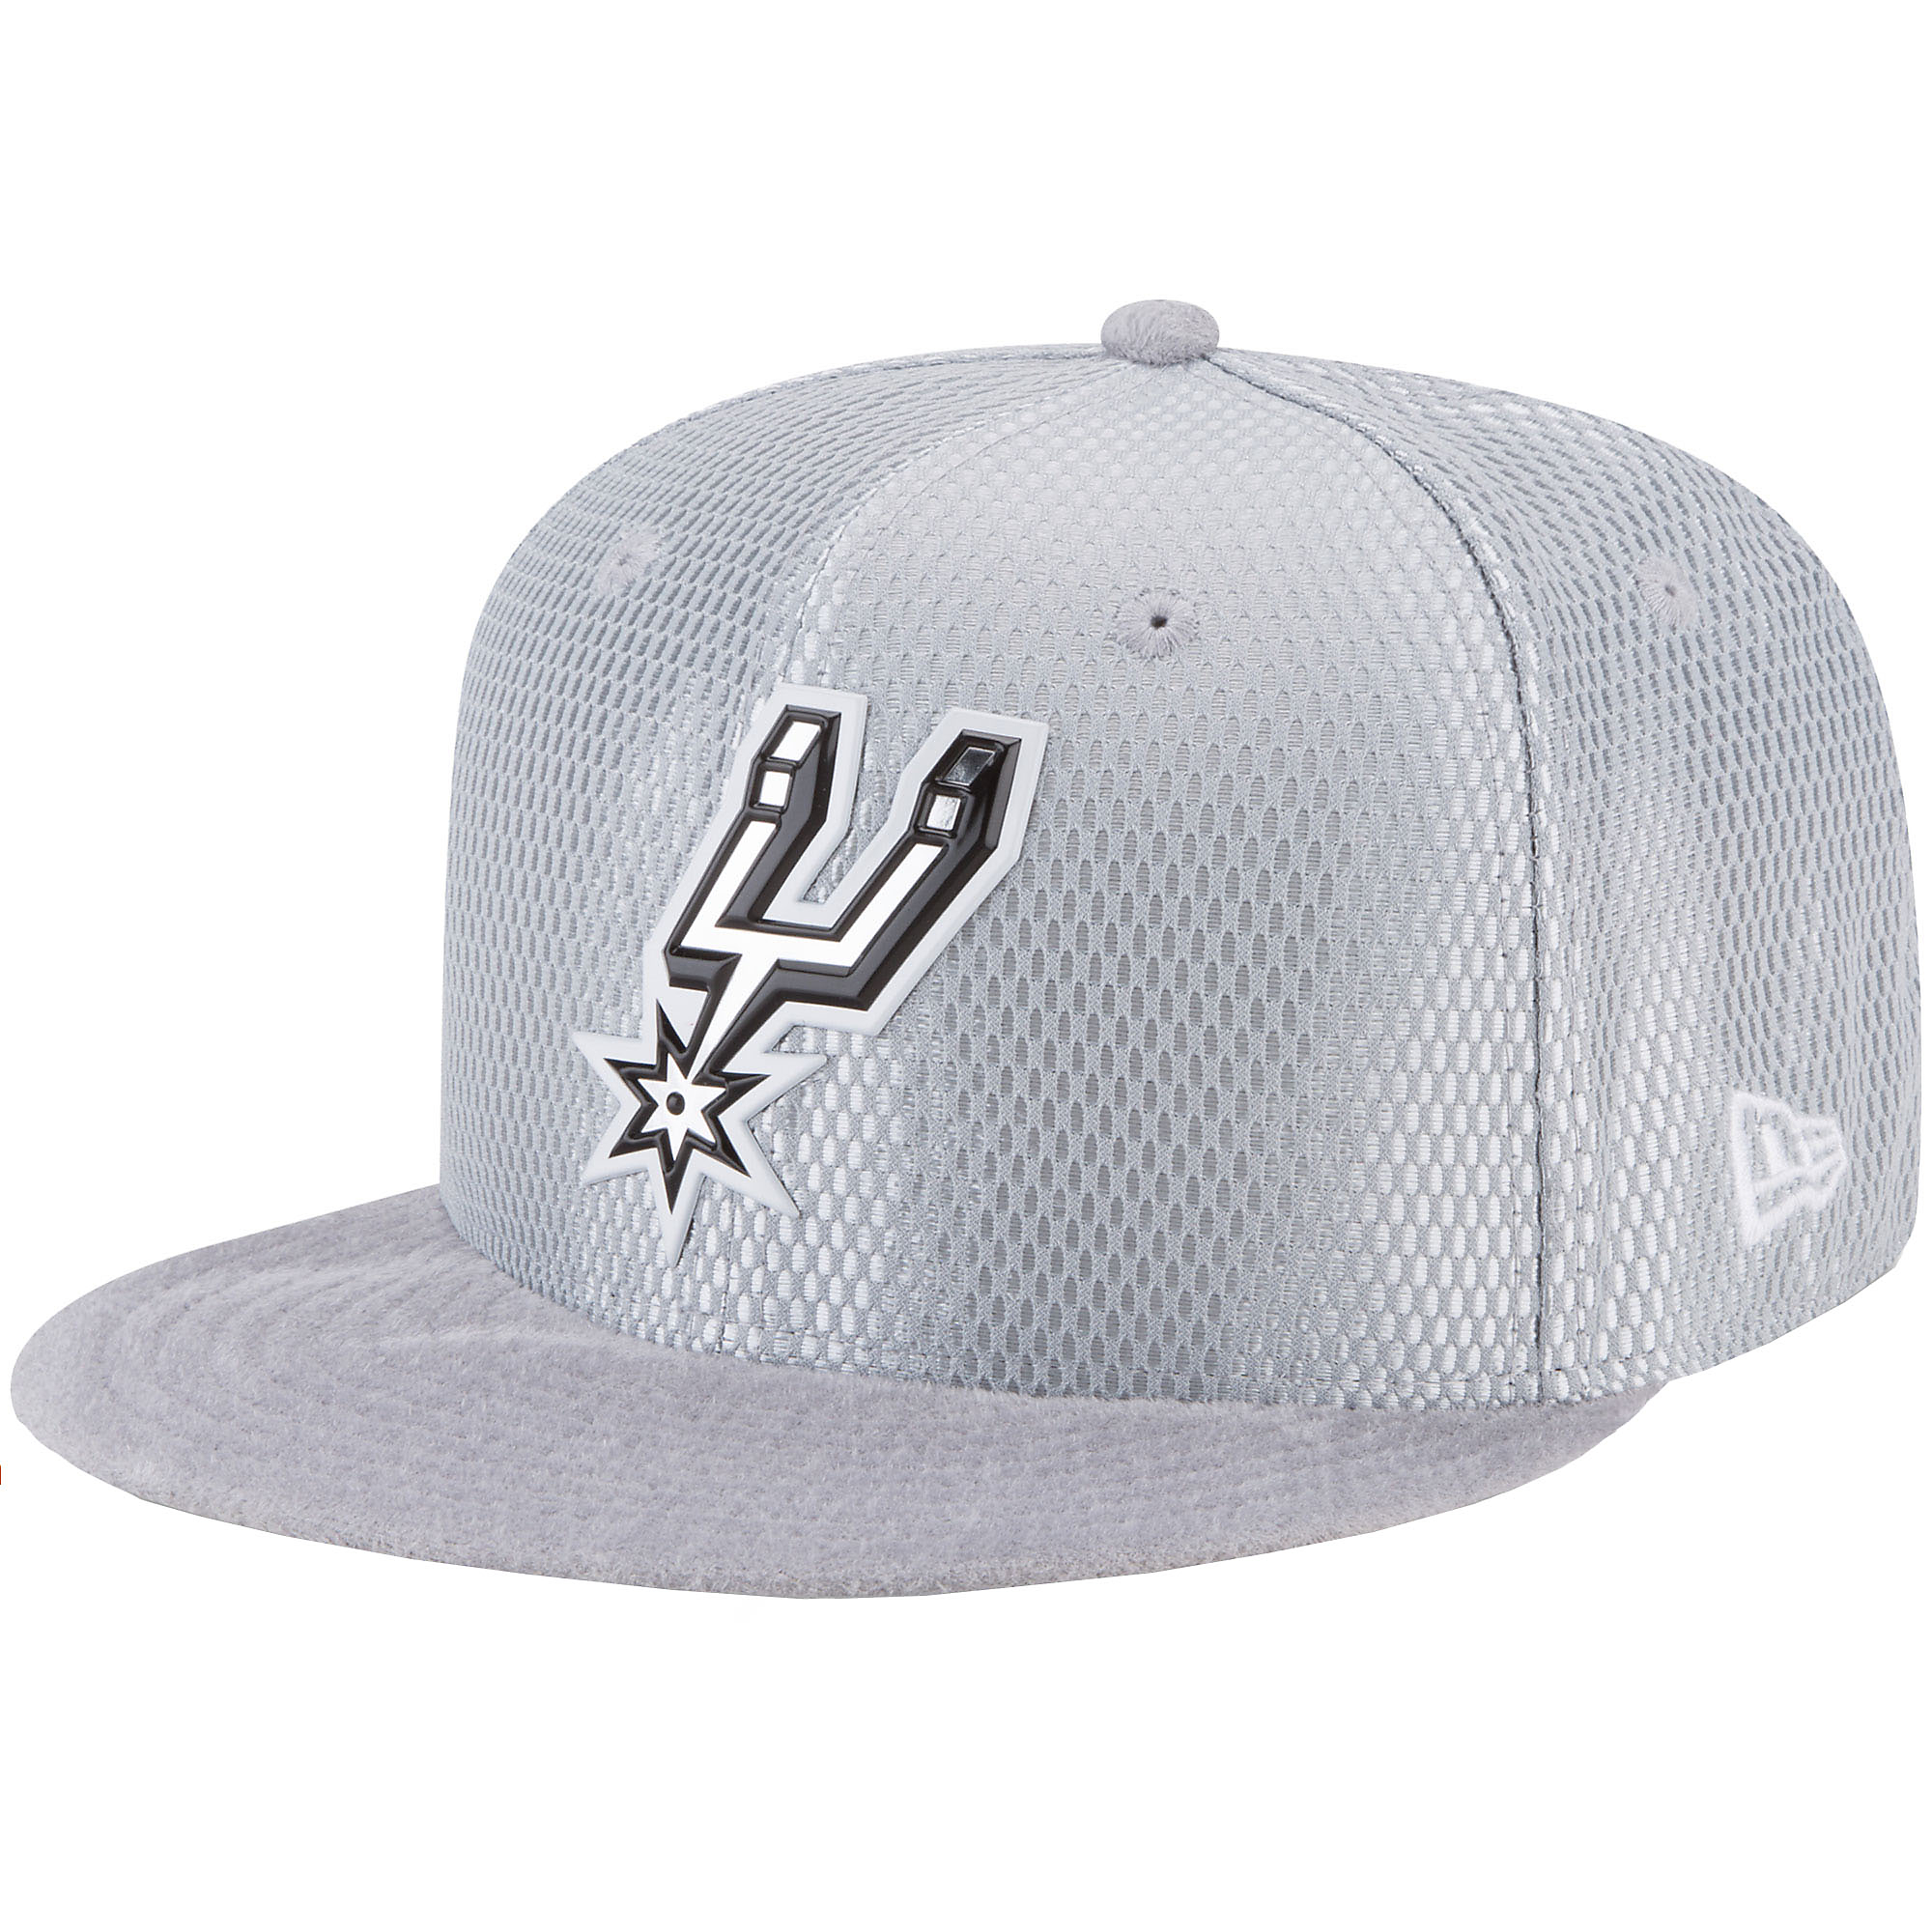 8fd71abfcb8 San Antonio Spurs New Era On-Court Grey Snapback Cap